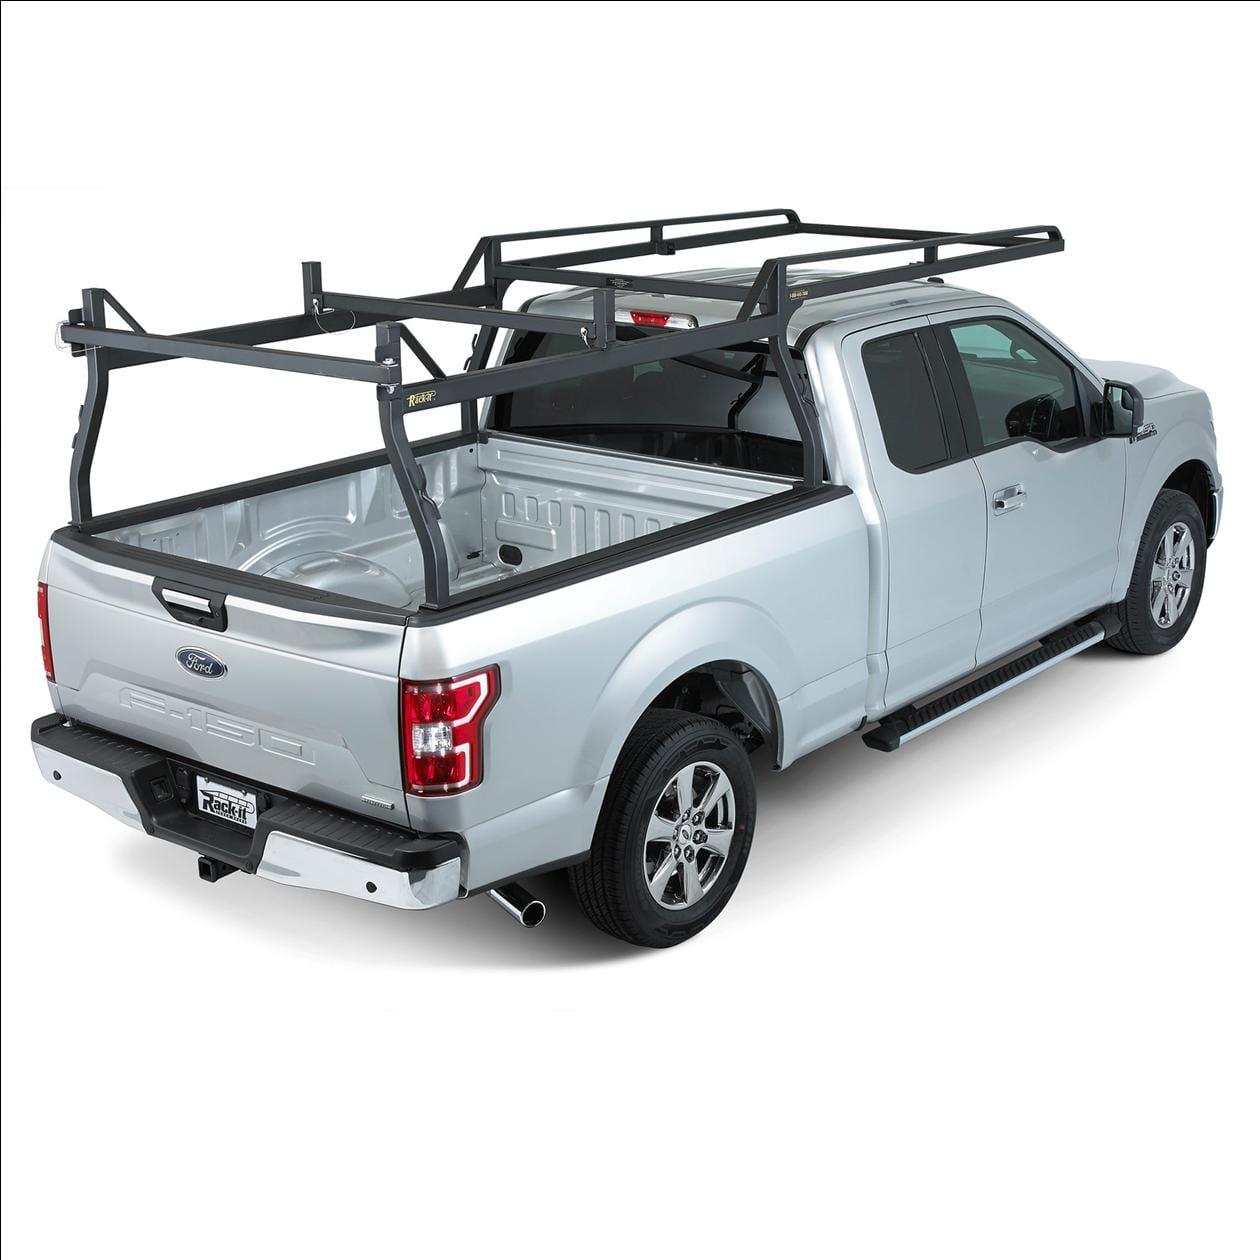 rack it inc hd forklift loadable rack for ram pickuptrucks